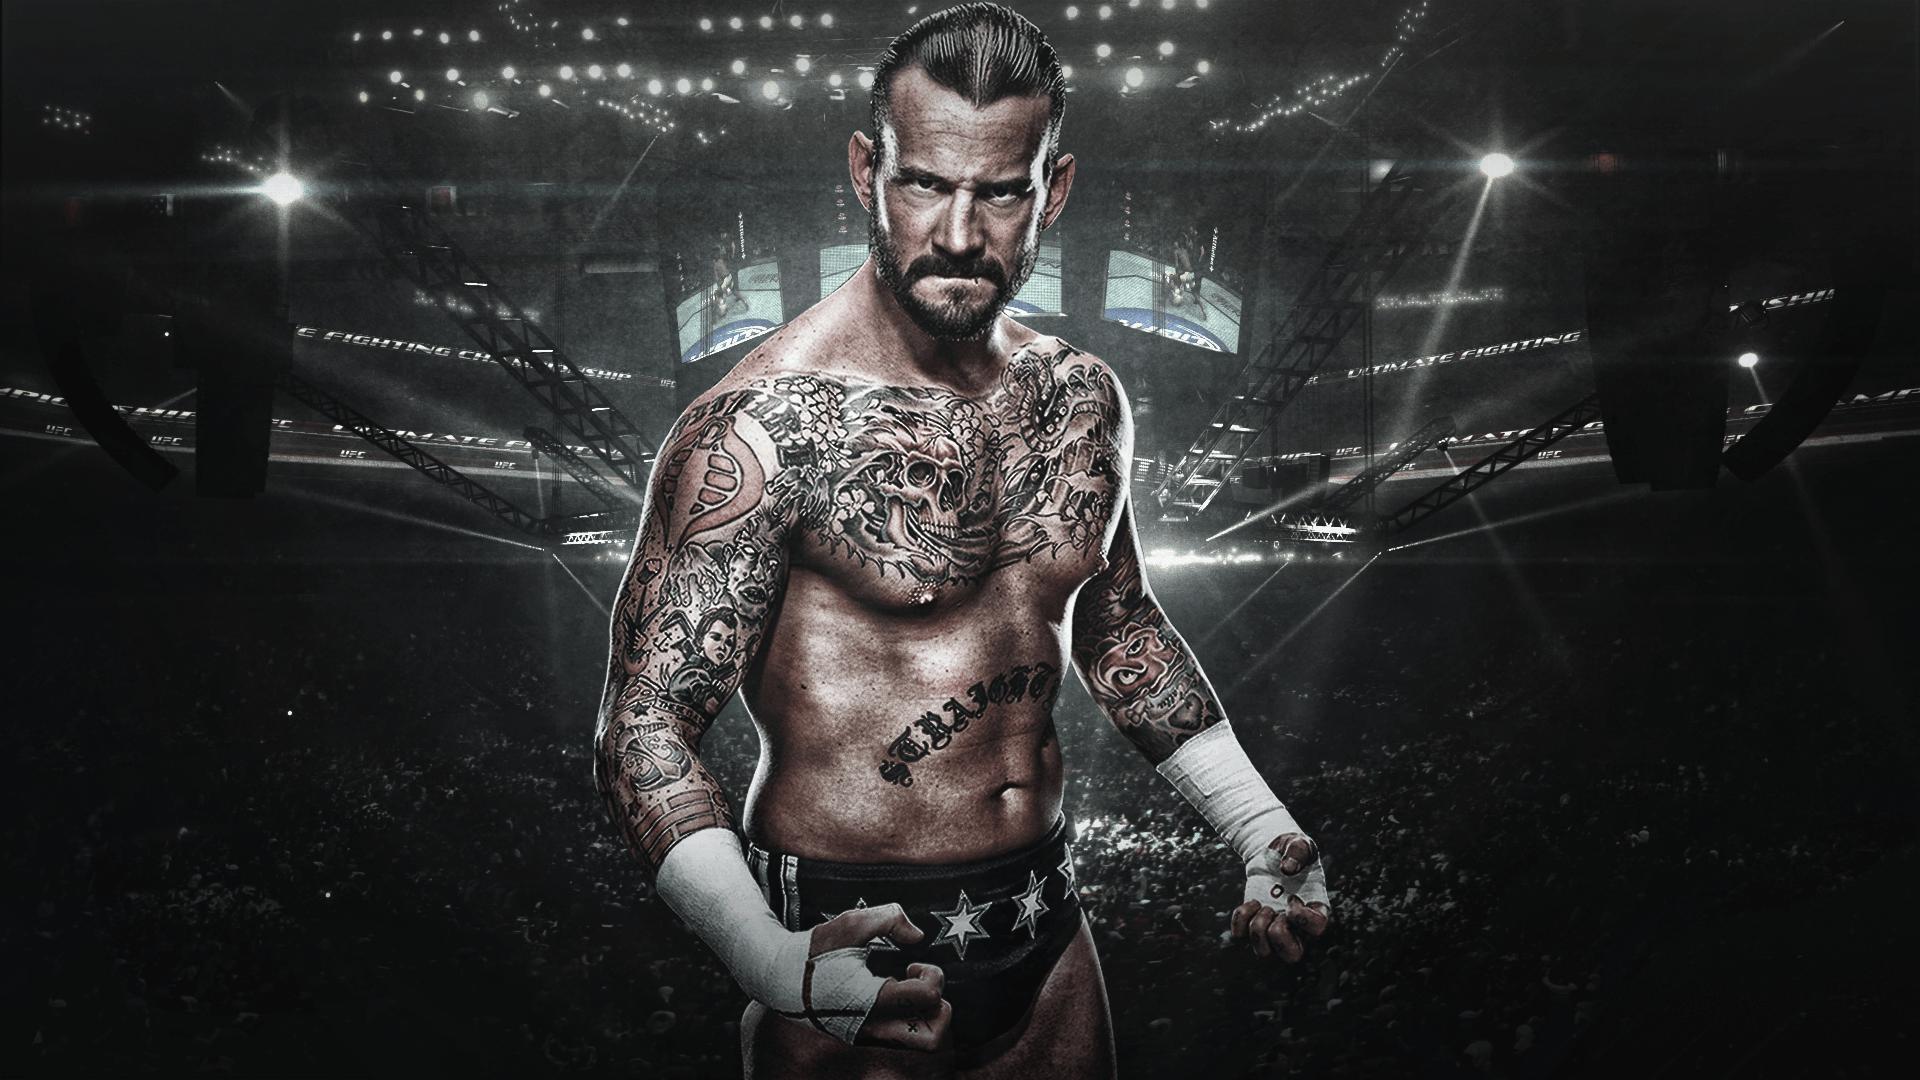 UFC Wallpapers 2016 1920x1080